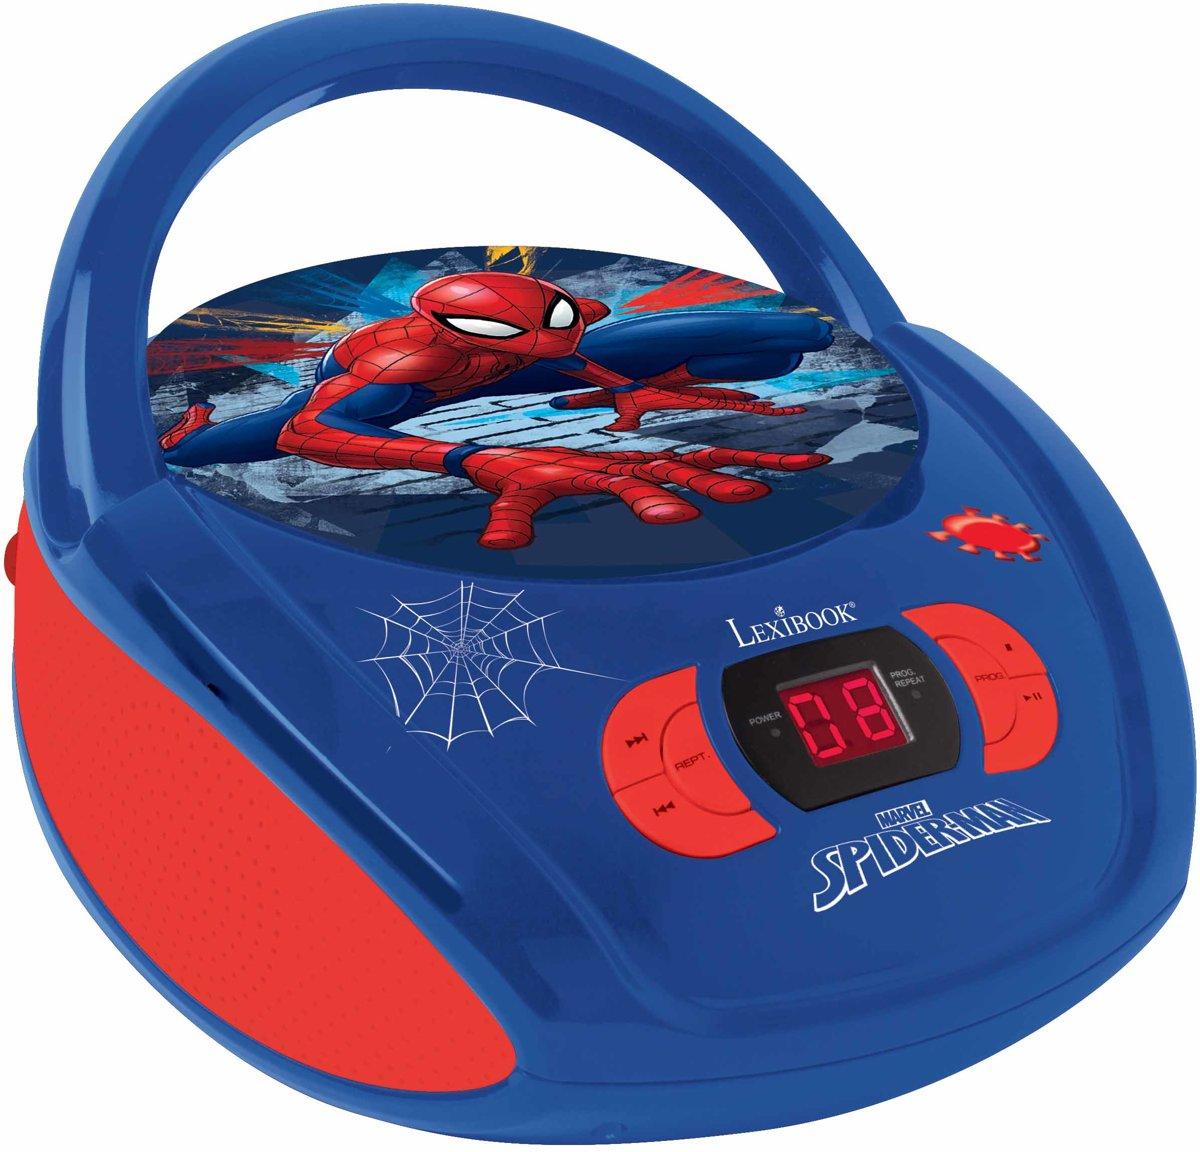 Lexibook Radio CD player Spider Man Draagbare cd-speler Blauw, Rood